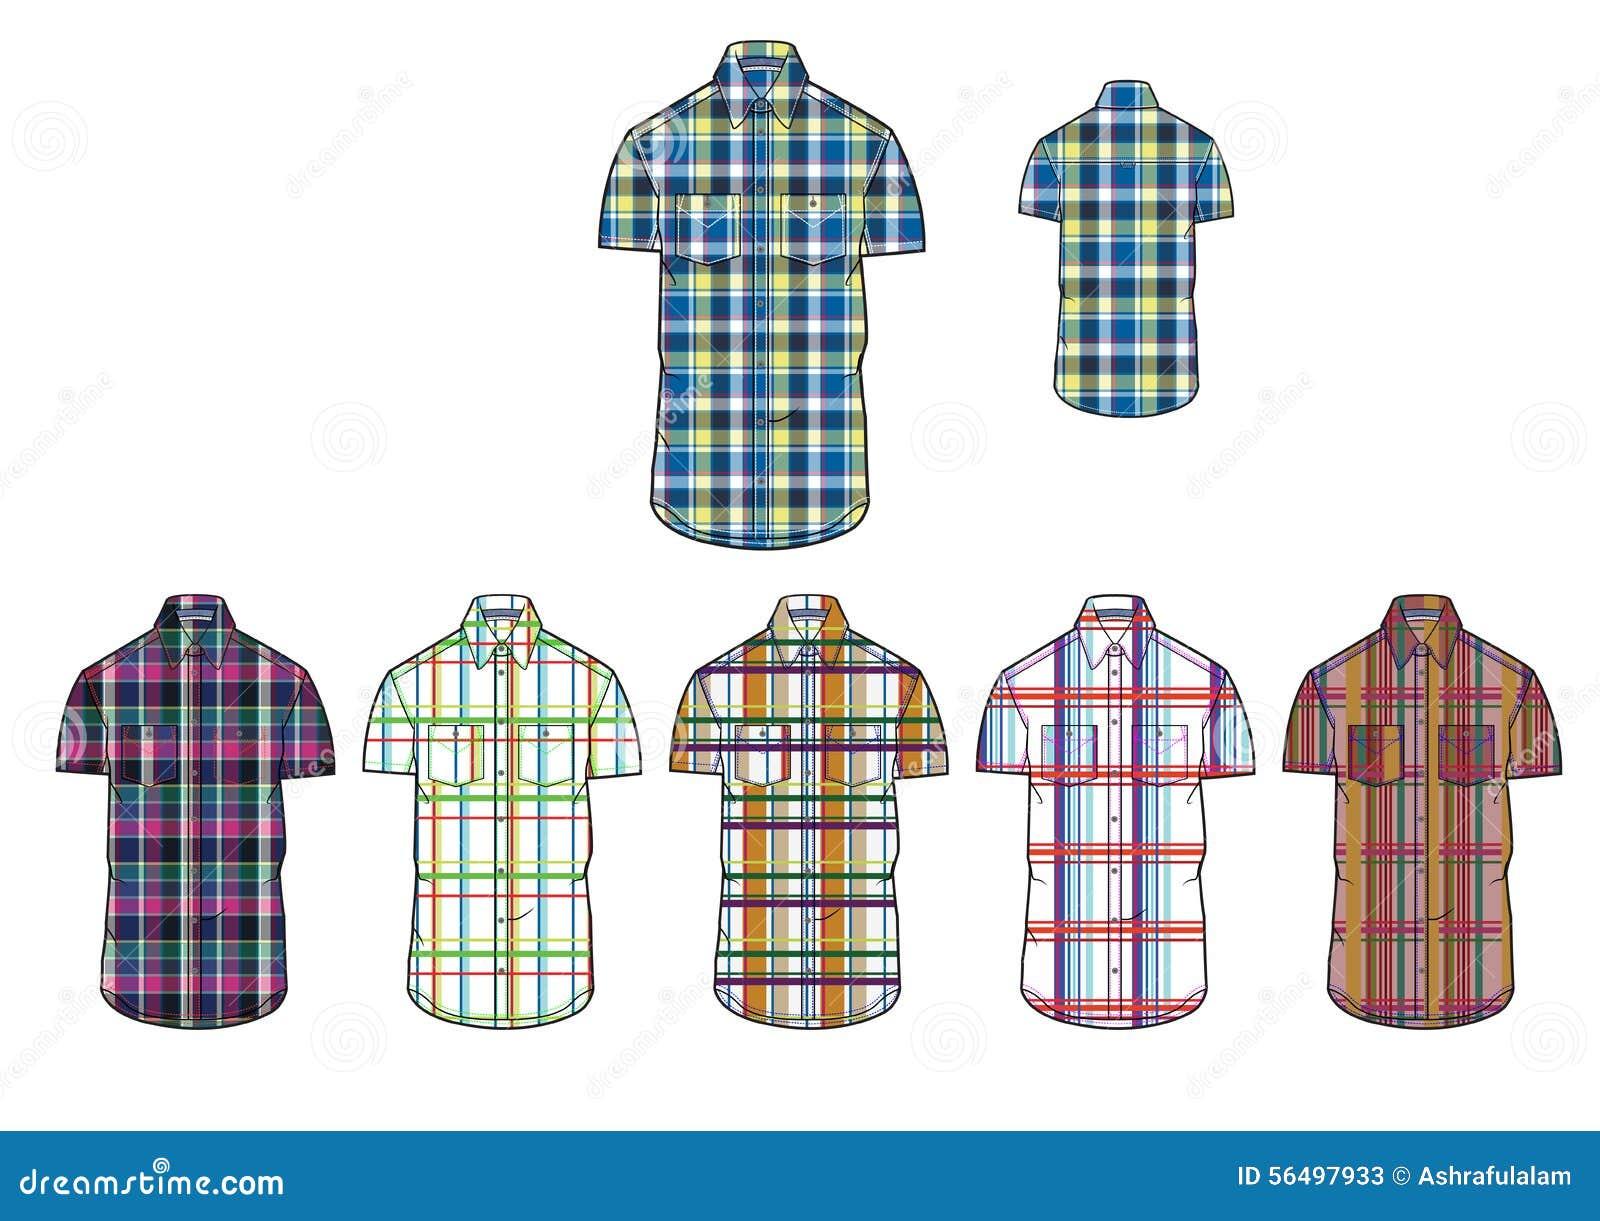 Shirt design illustrator template - Mans Short Sleeve Various Check Shirt Clothing Design Template Stock Photos